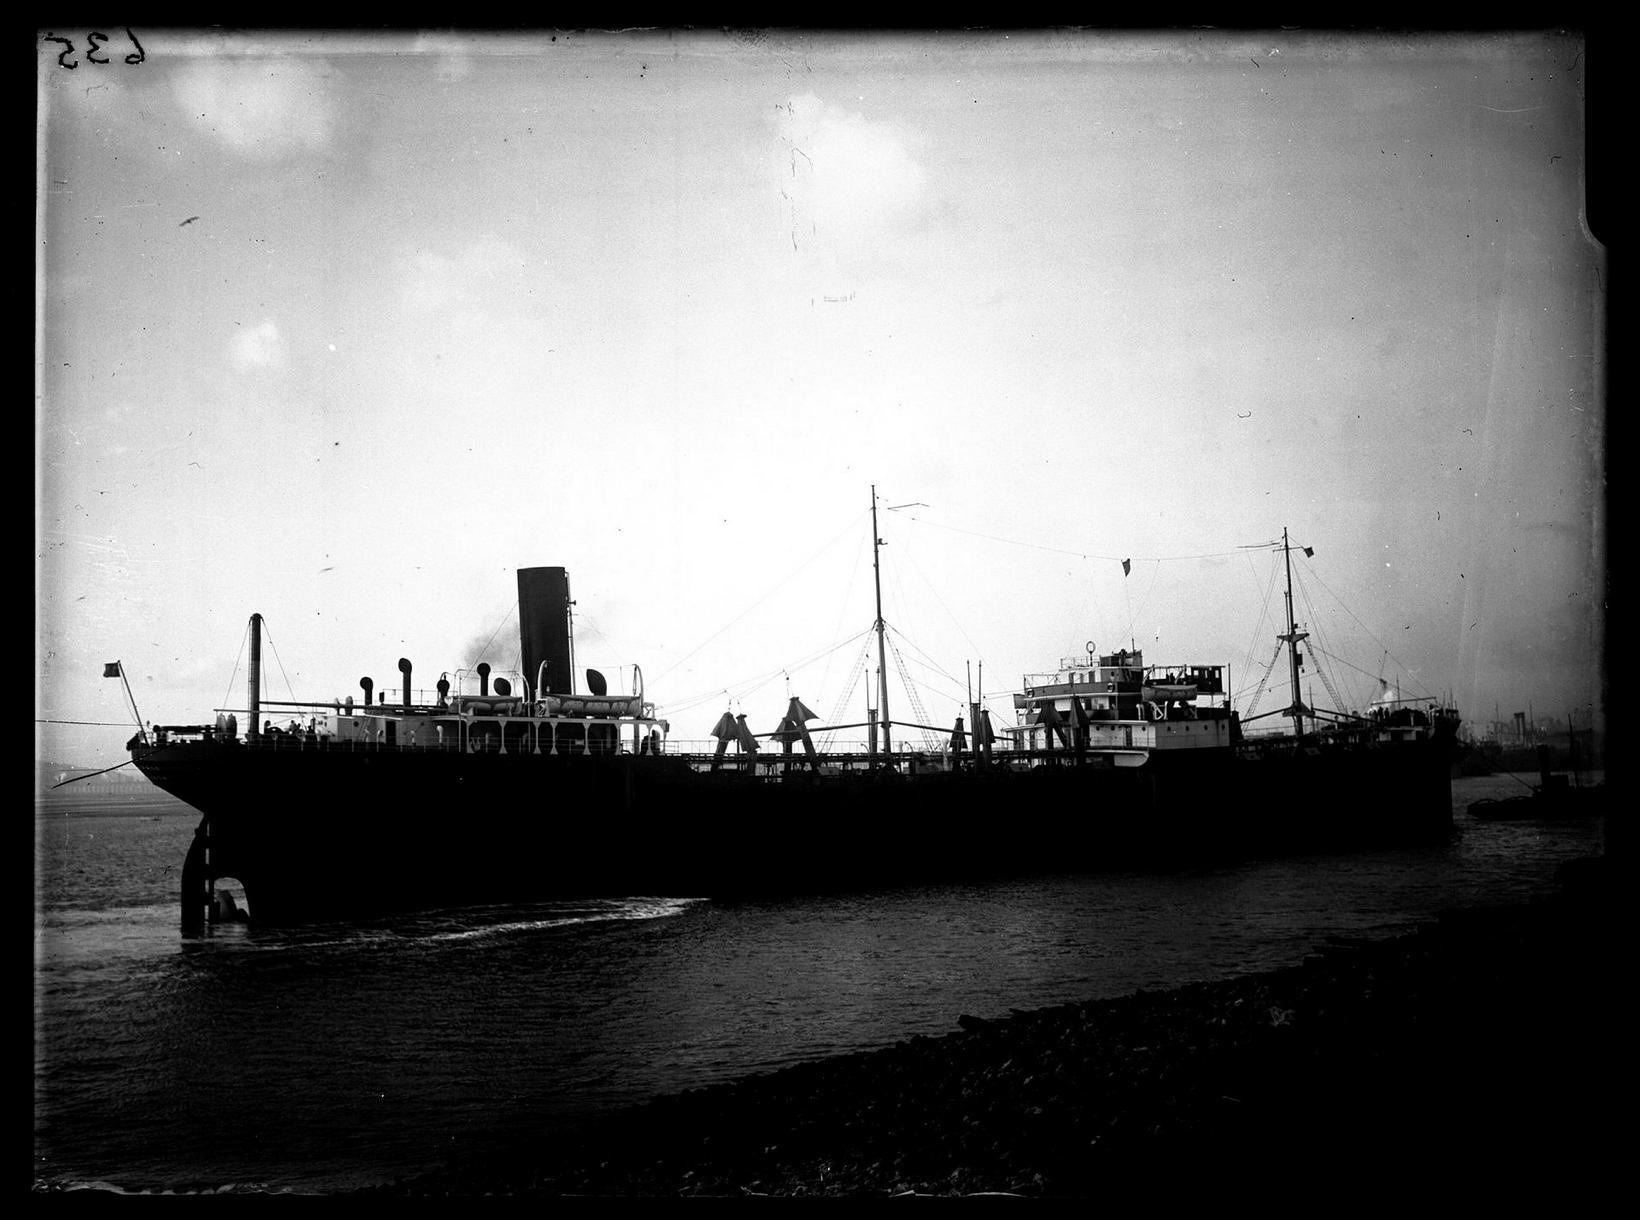 El Grillo, before it was shot down in 1944.